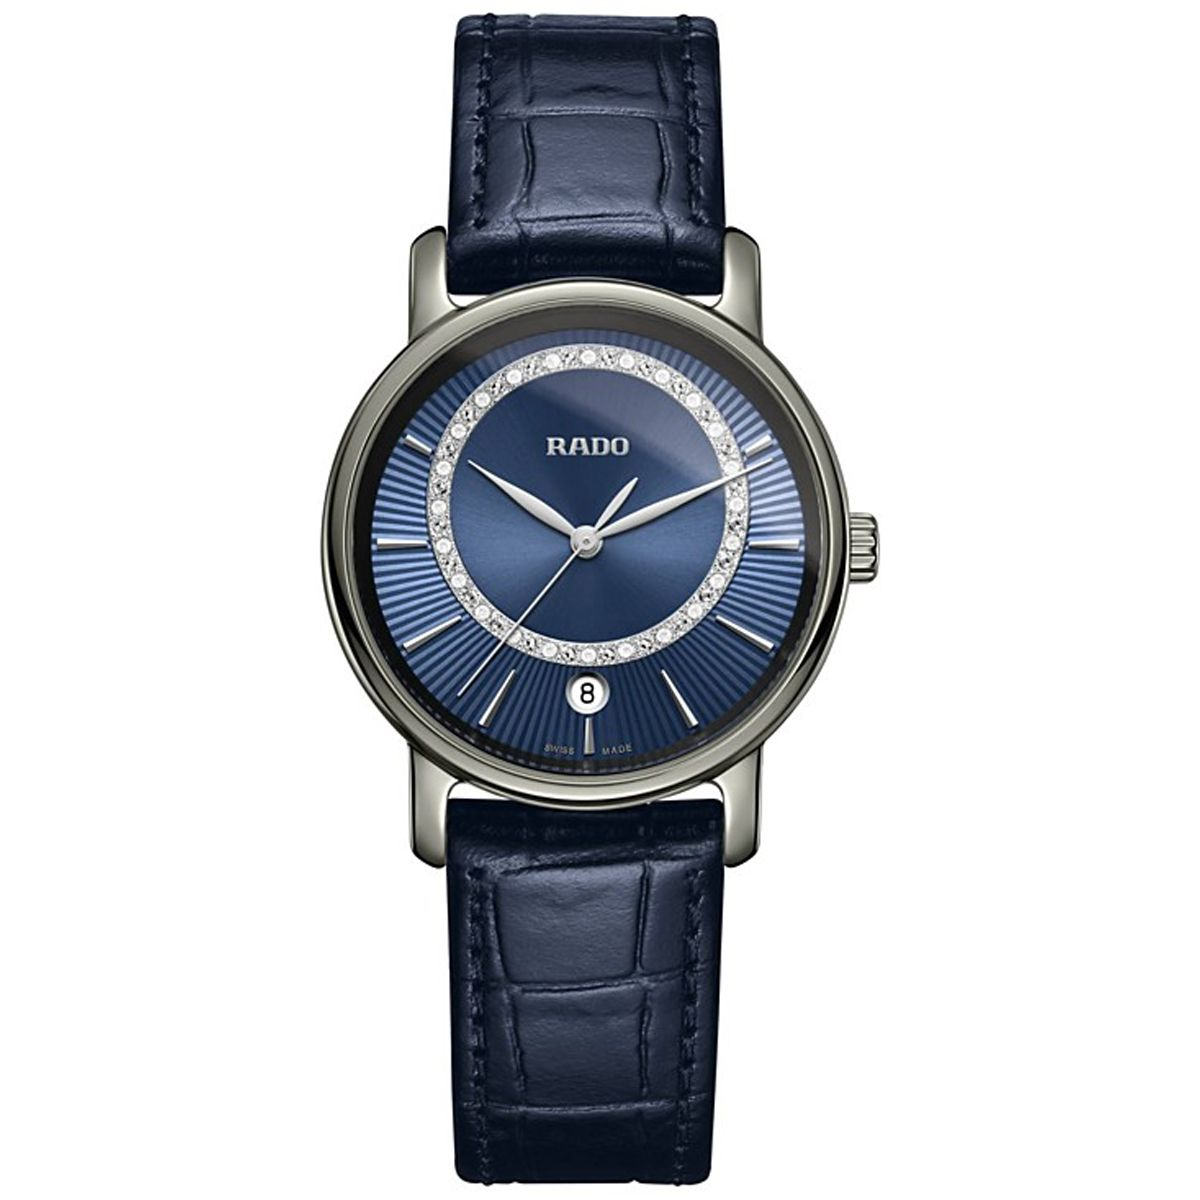 ec4636a60 Rado Luxury Watches - Macy's